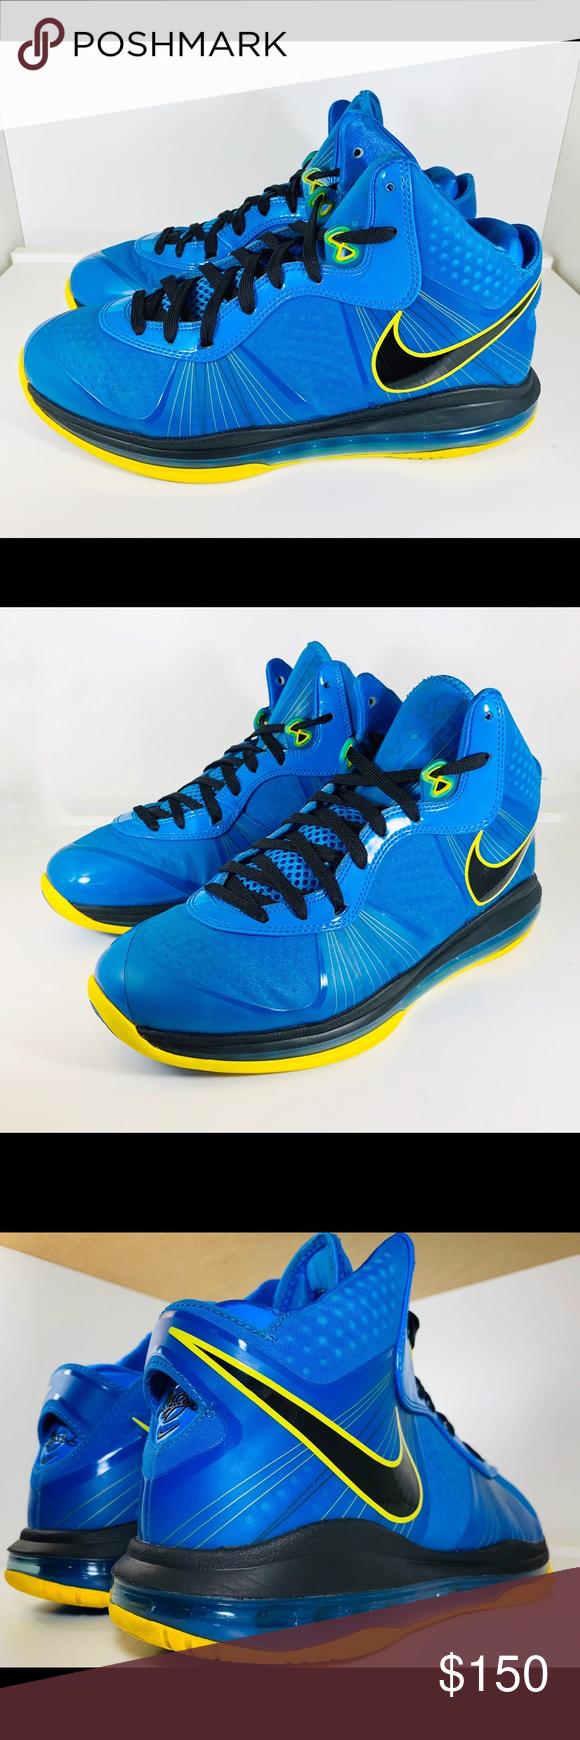 "24a95a4dddc7 Nike Lebron 8 V2 ""Entourage"" size 11 Excellent condition Nike Lebron 8 V2 "" Entourage"" men s size 11. - Condition (9 10) - minimal heel drag - no box  Nike ..."